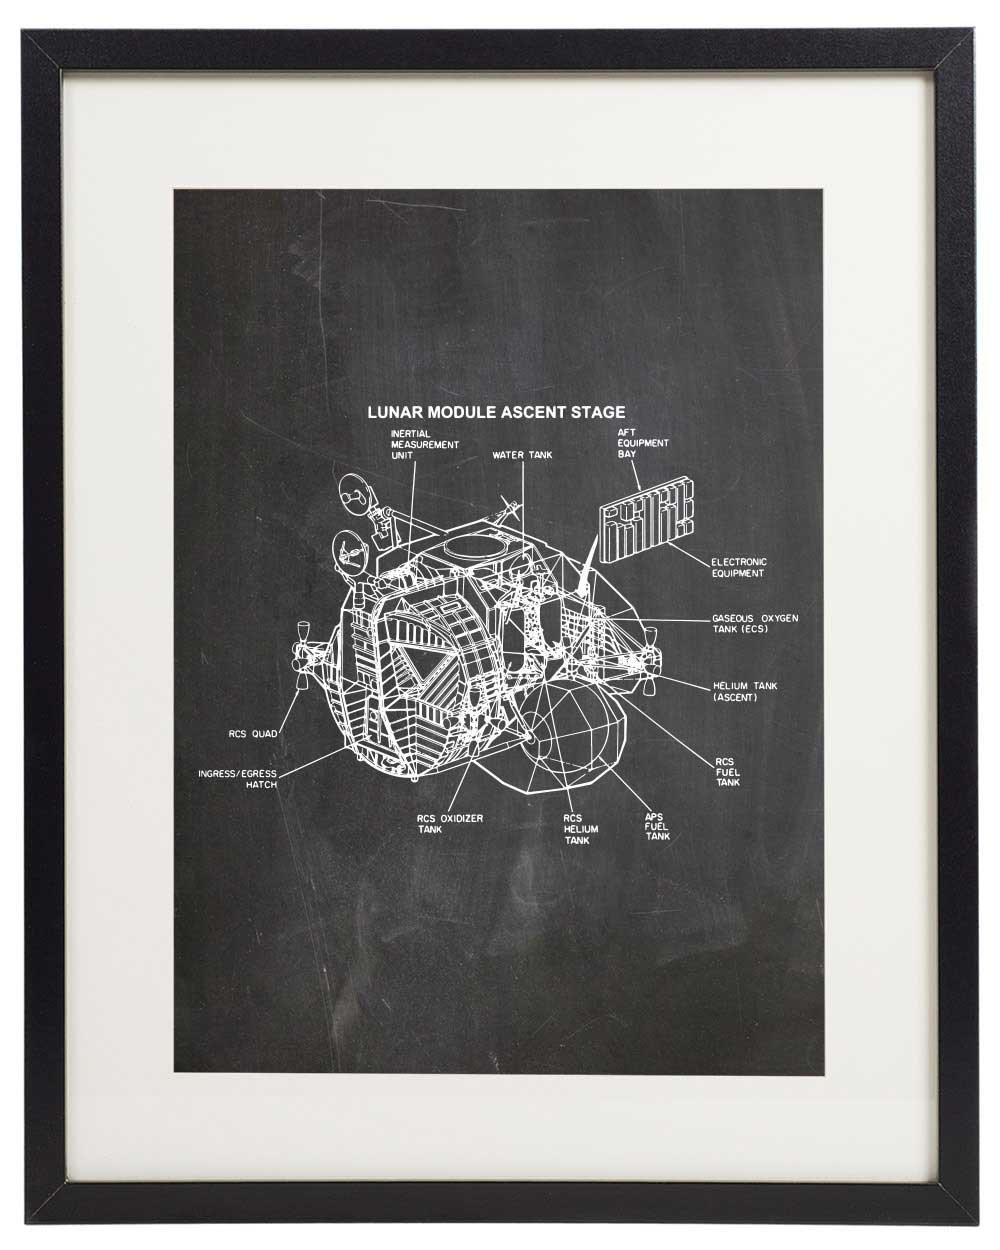 IDIOPIX Space 04 Patent Wall Decor Chalkboard Art Print Set of 6 Prints UNFRAMED